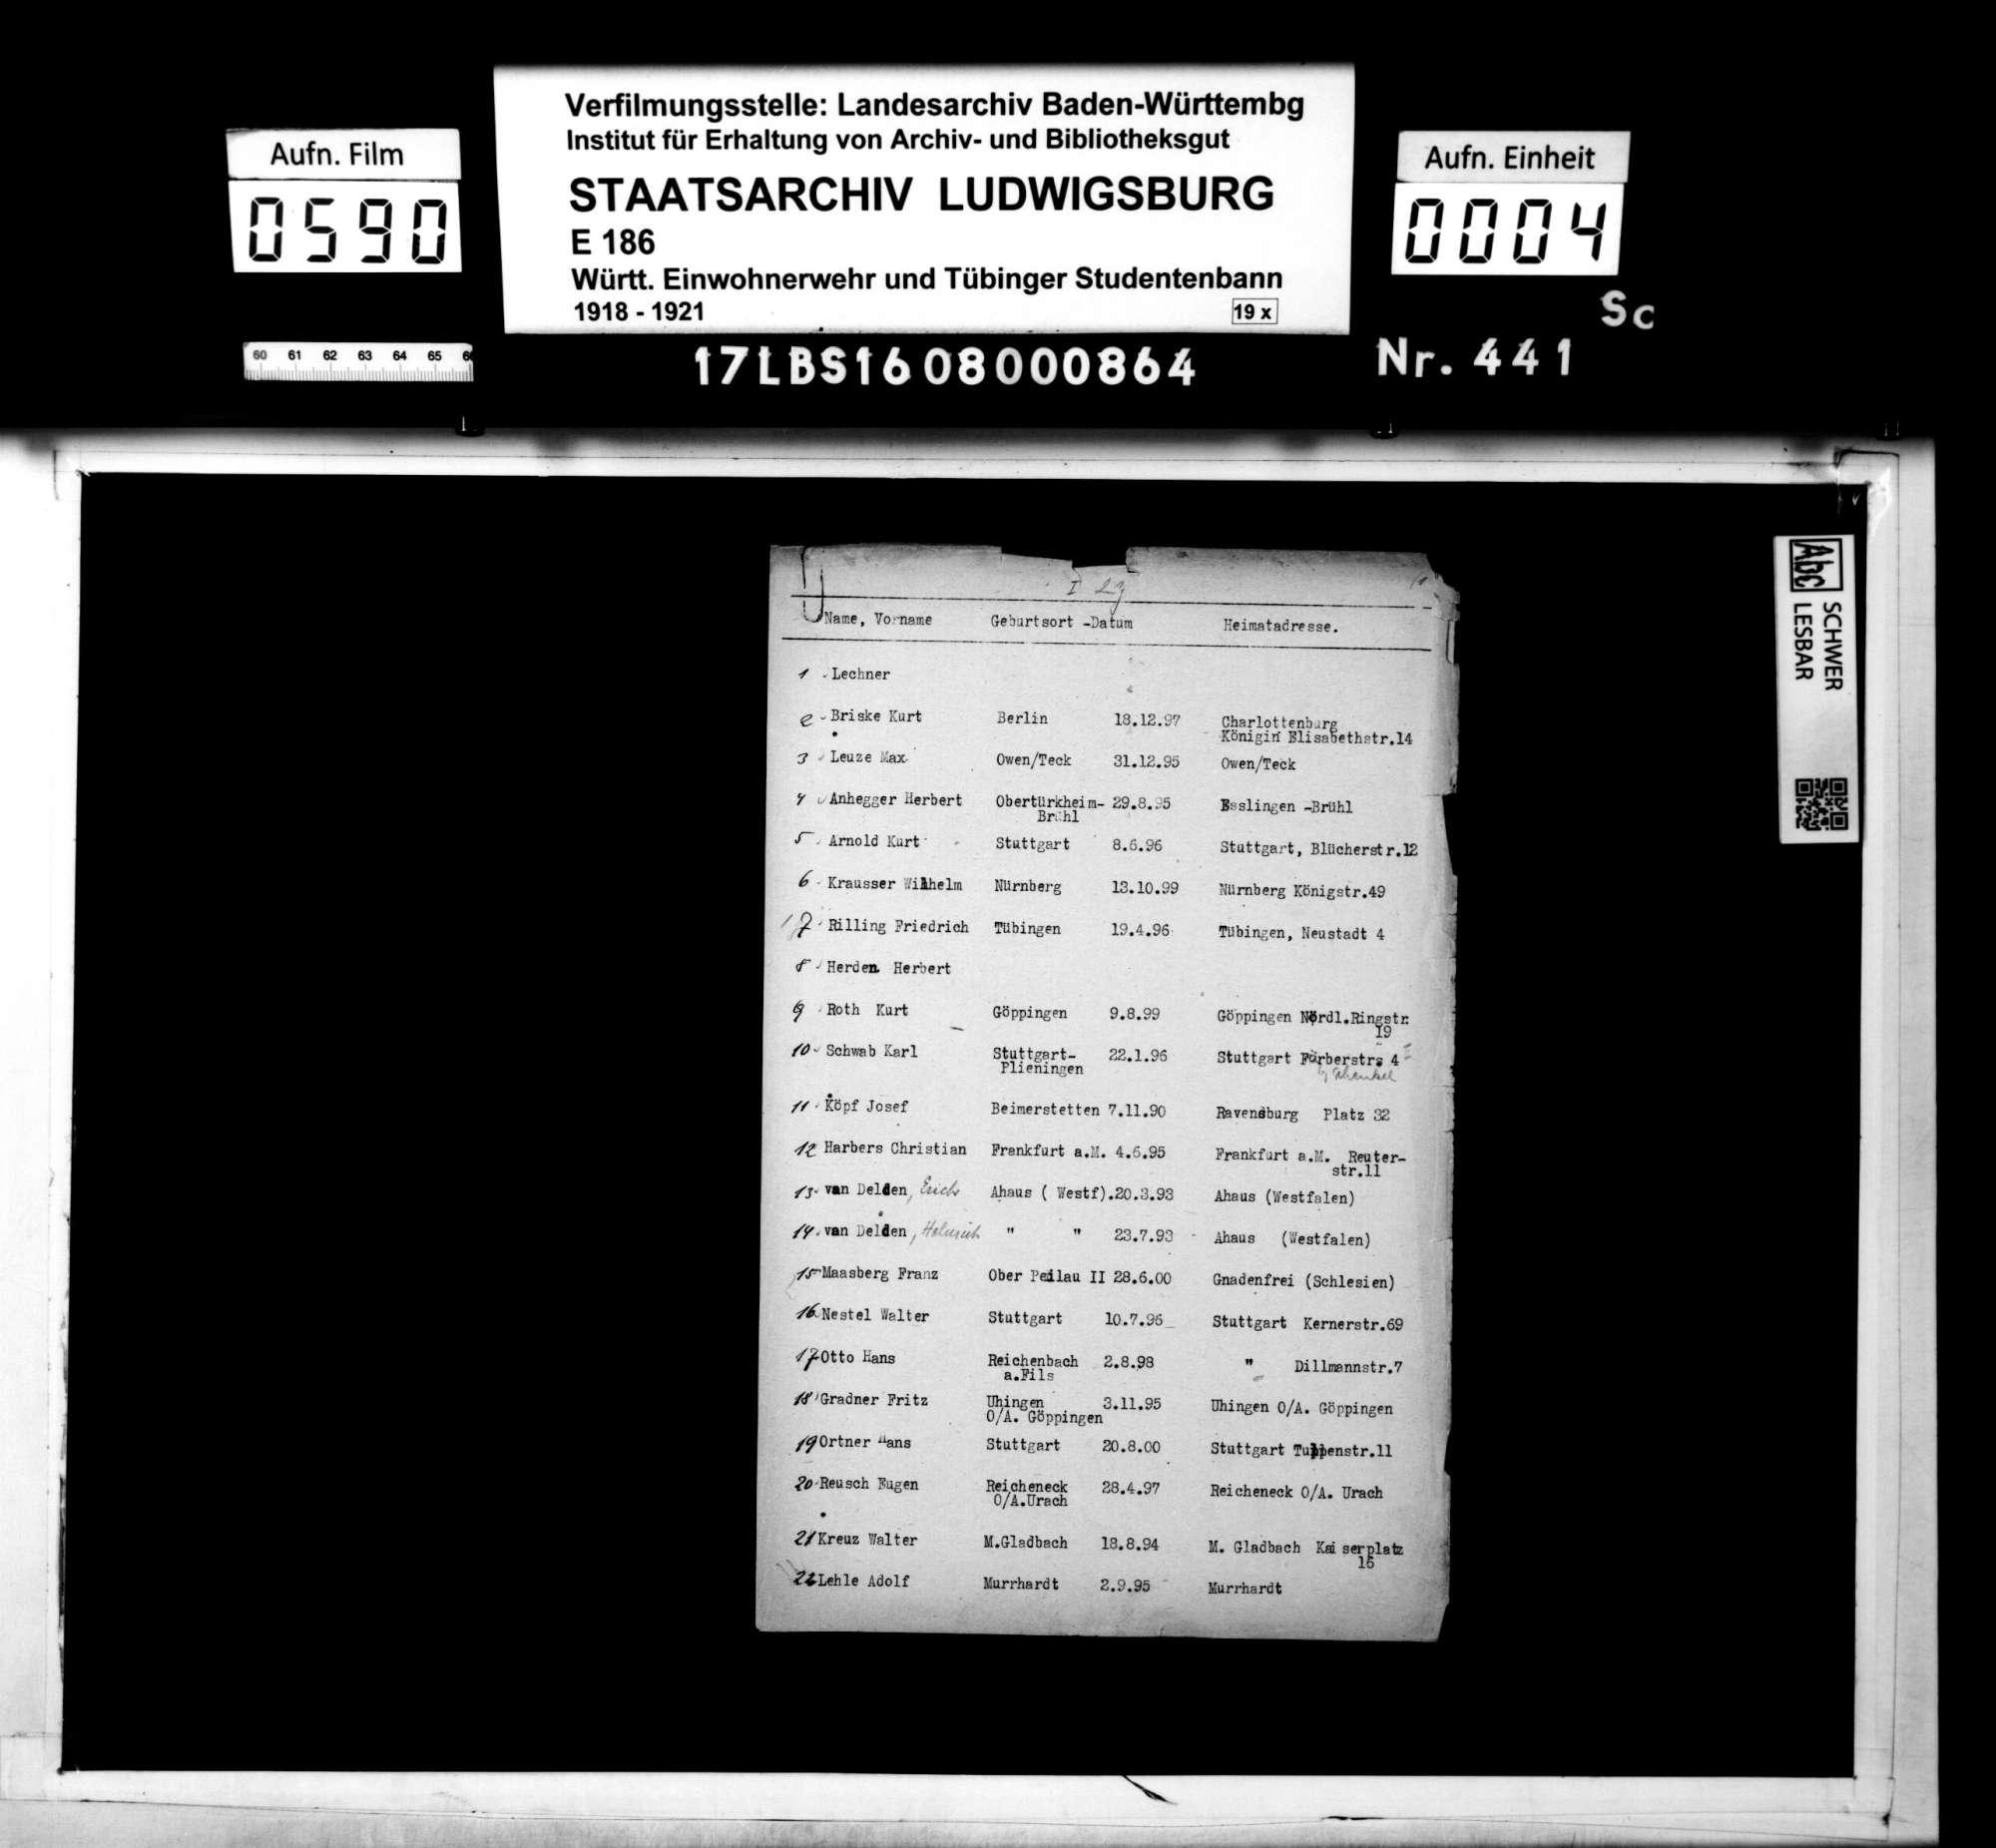 Techniker-Kompanie aus Reutlingen, Bild 2